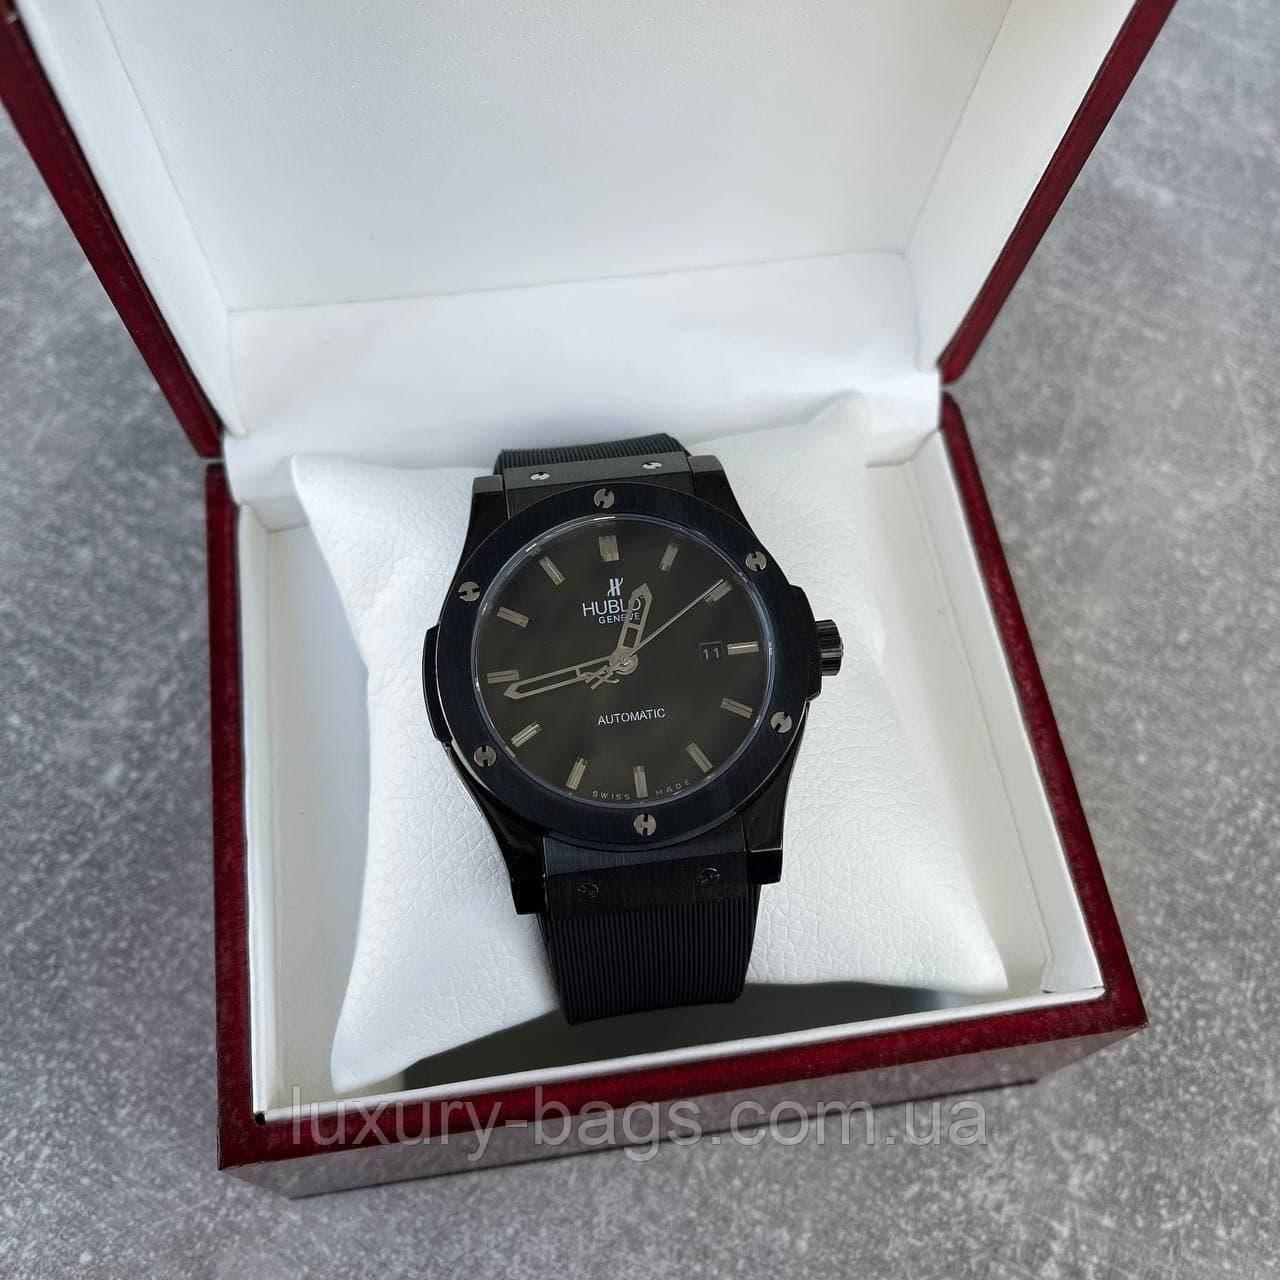 Годинники чоловічі Hubl0t Classic Fusion 5826 All Black